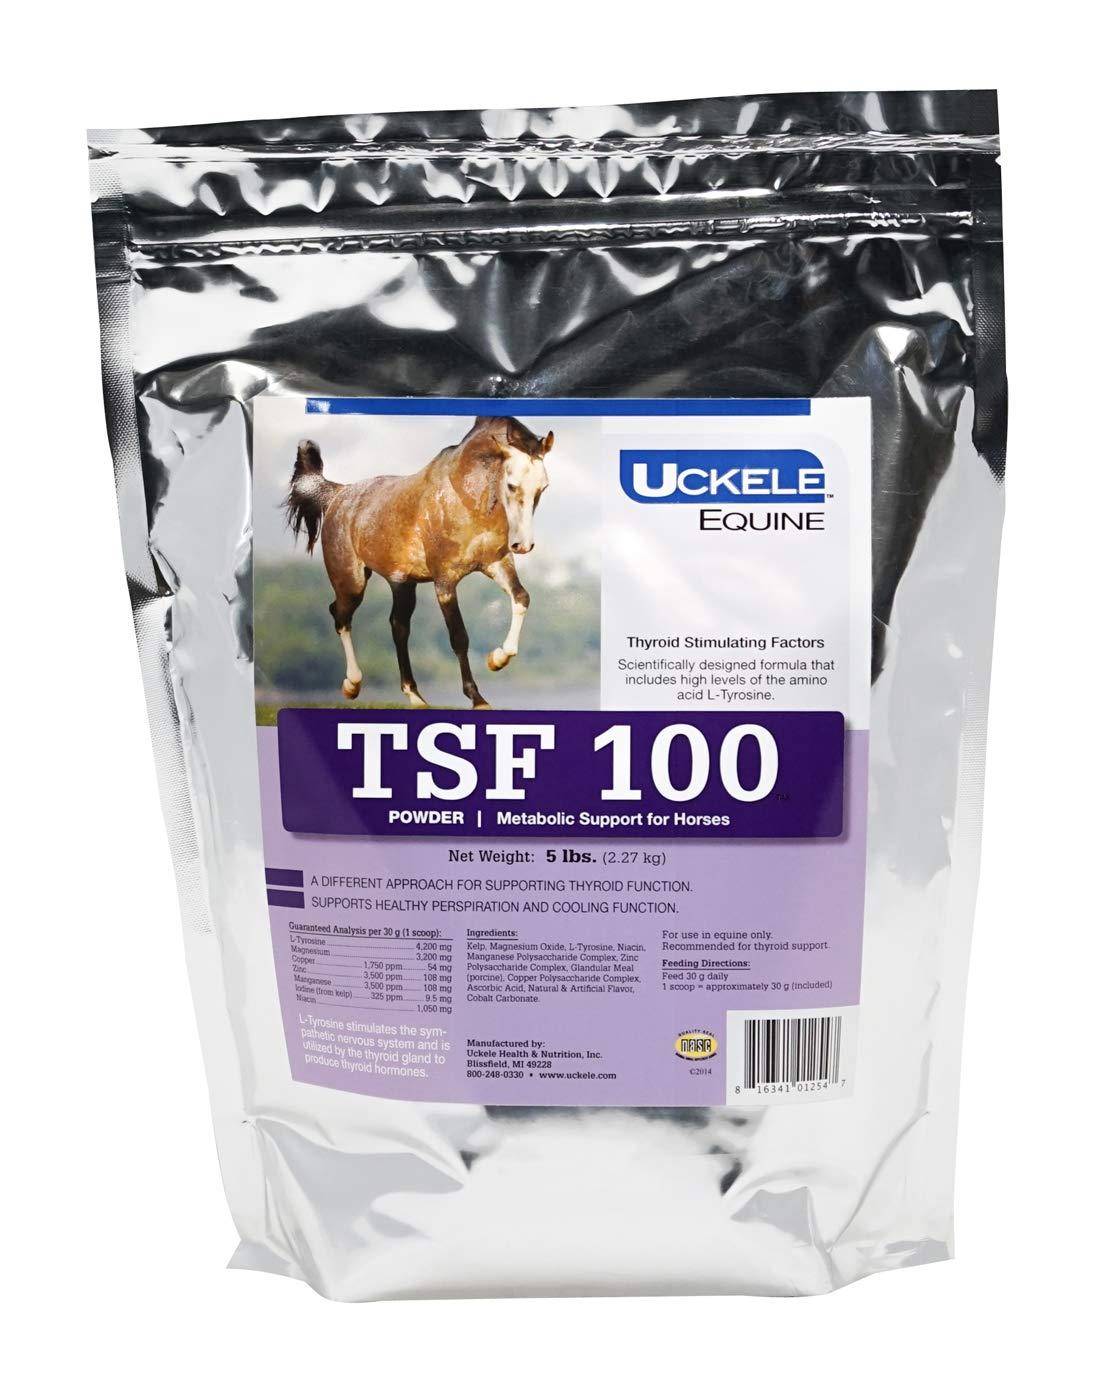 Uckele Equine TSF 100 Metabolic Support Powder, 5 Pound Bag by Uckele (Image #1)